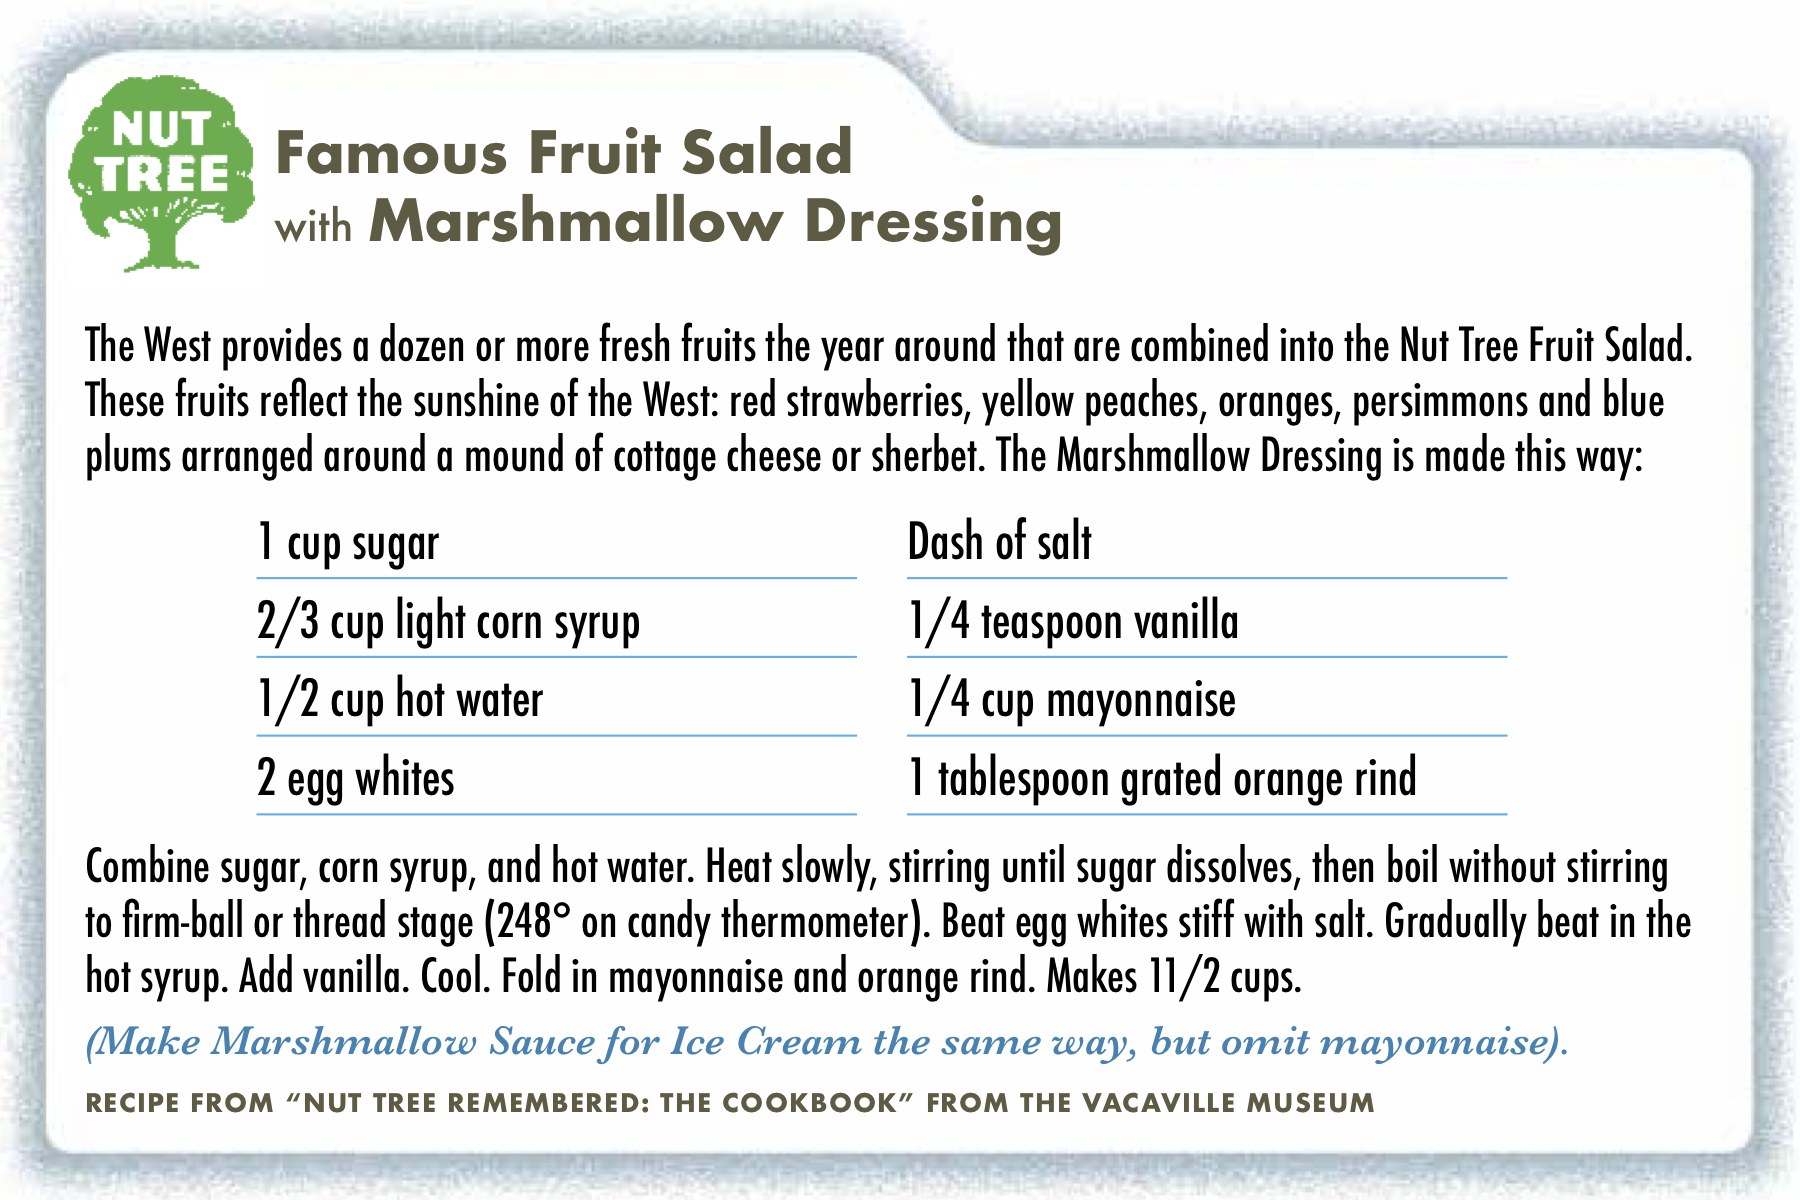 Nut Tree Marshamllow Recipe